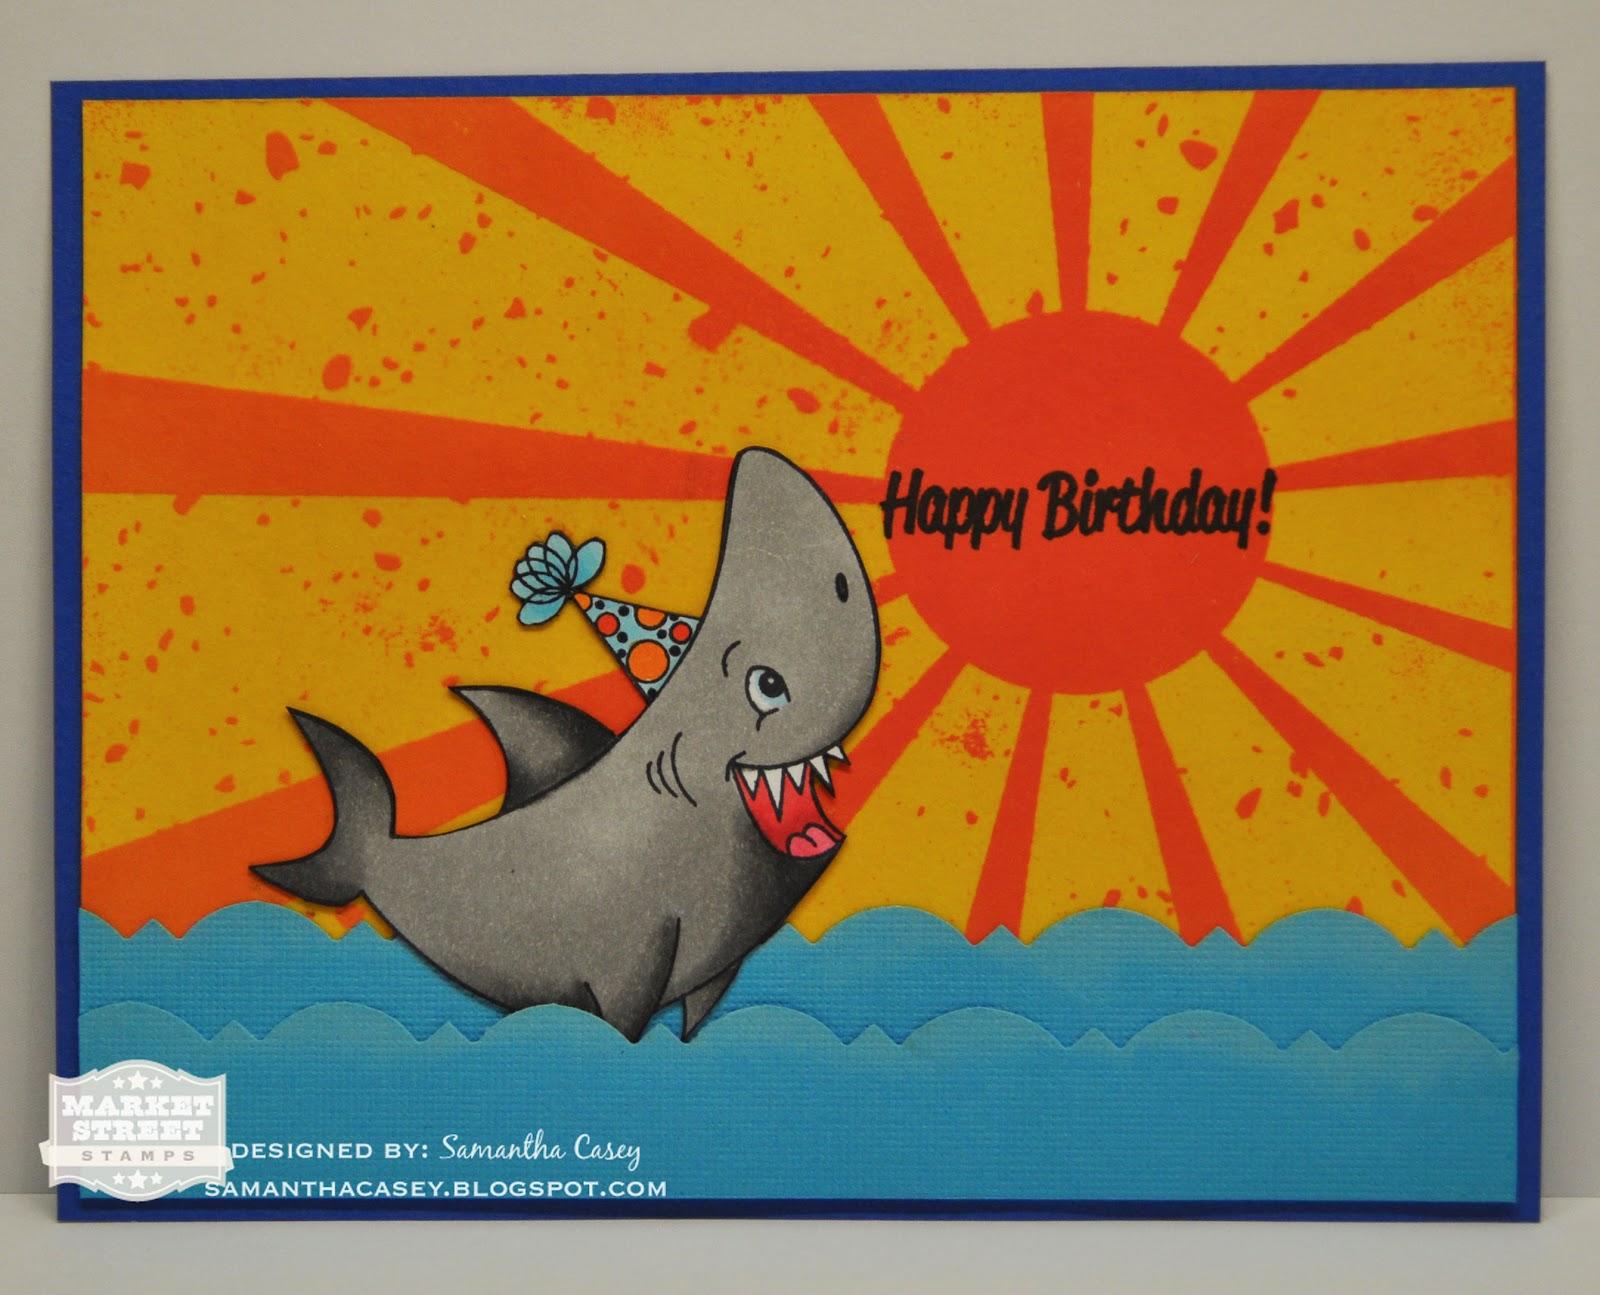 samantha casey happy birthday card using market street stamps, Birthday card